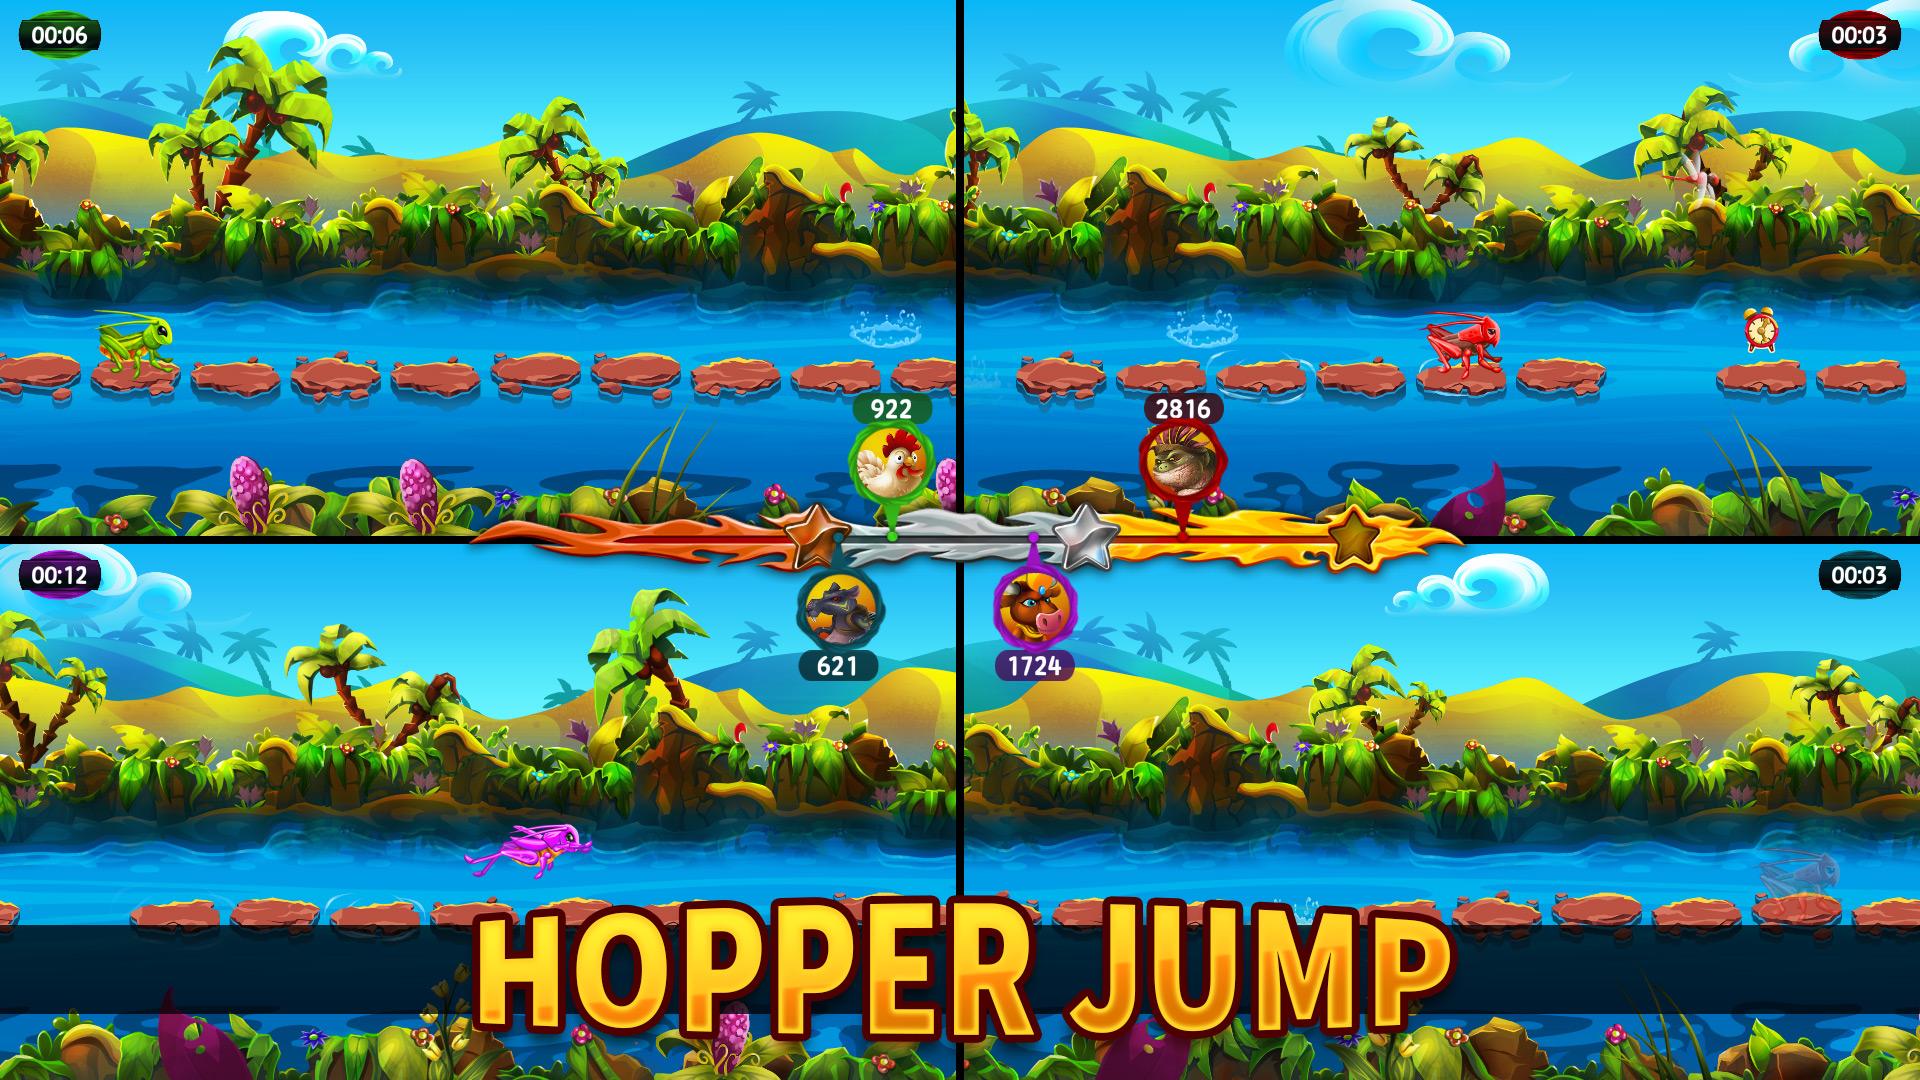 PP_HOPPER_JUMP